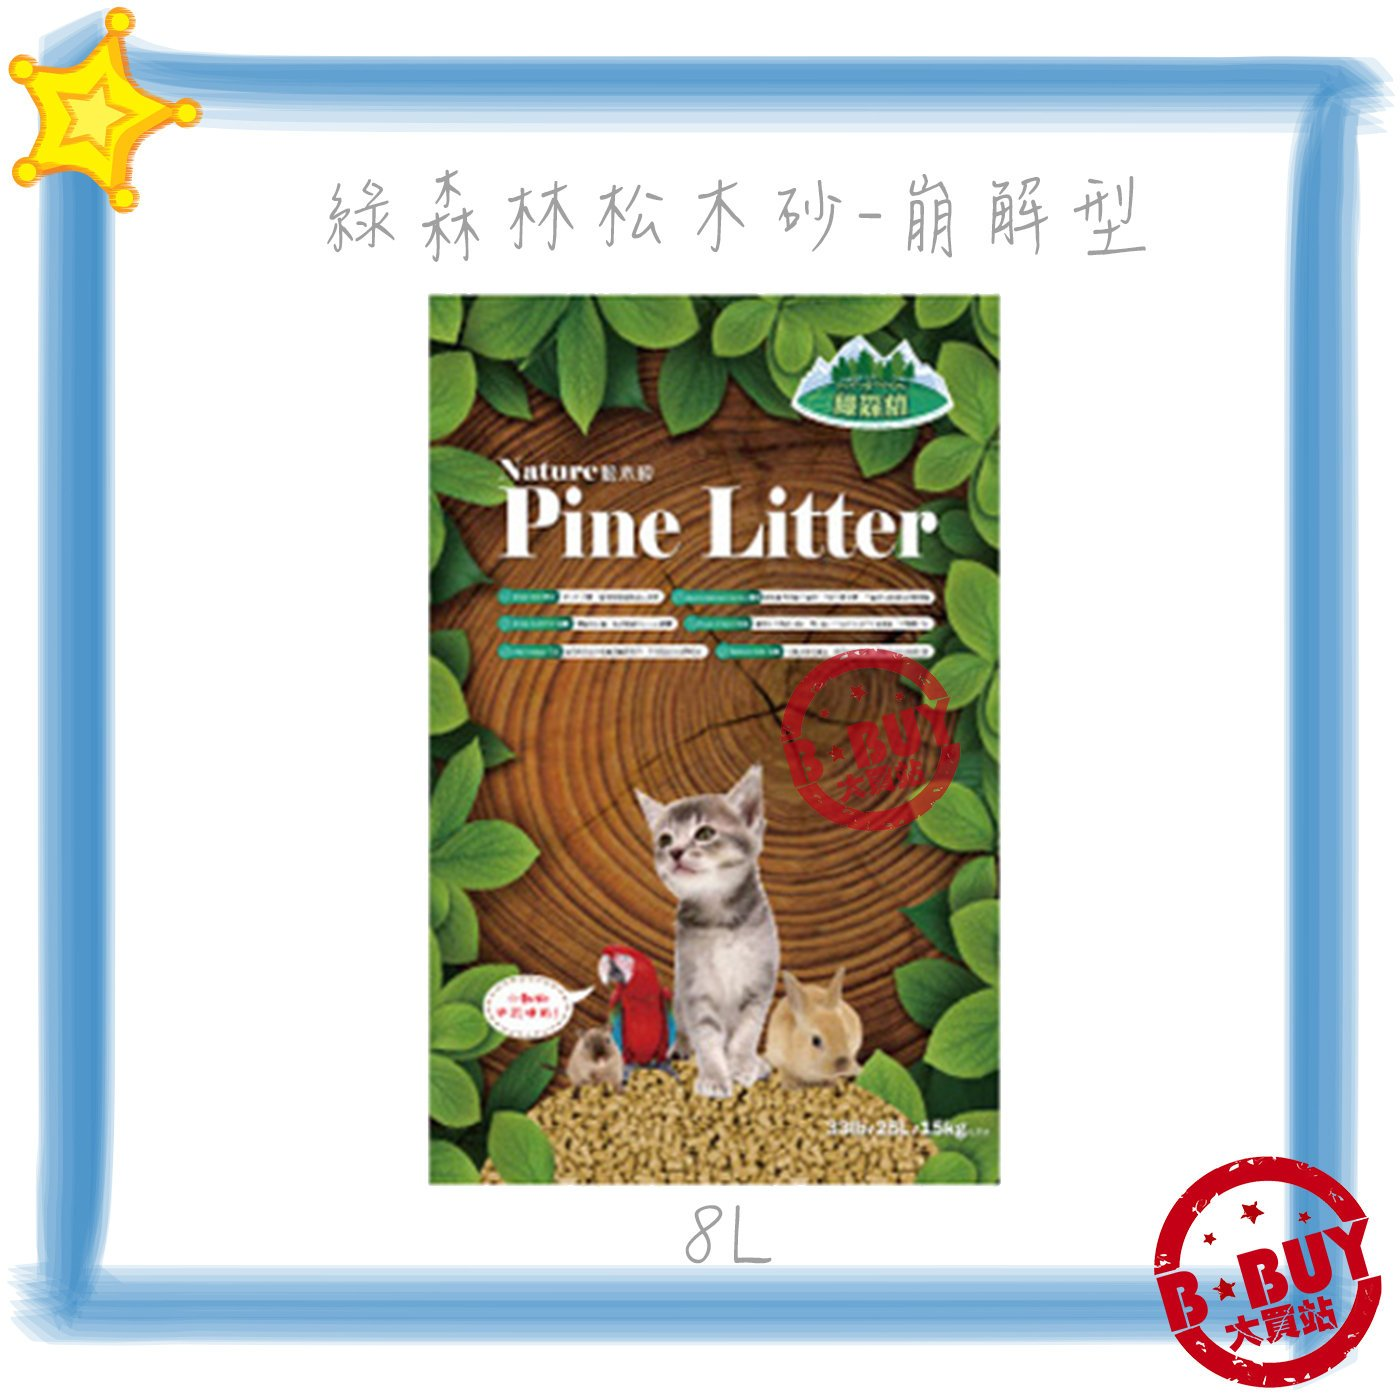 BBUY 綠森林 松木砂 崩解型 貓砂 木屑砂 強力吸收除臭 8L 區 犬貓寵物用品